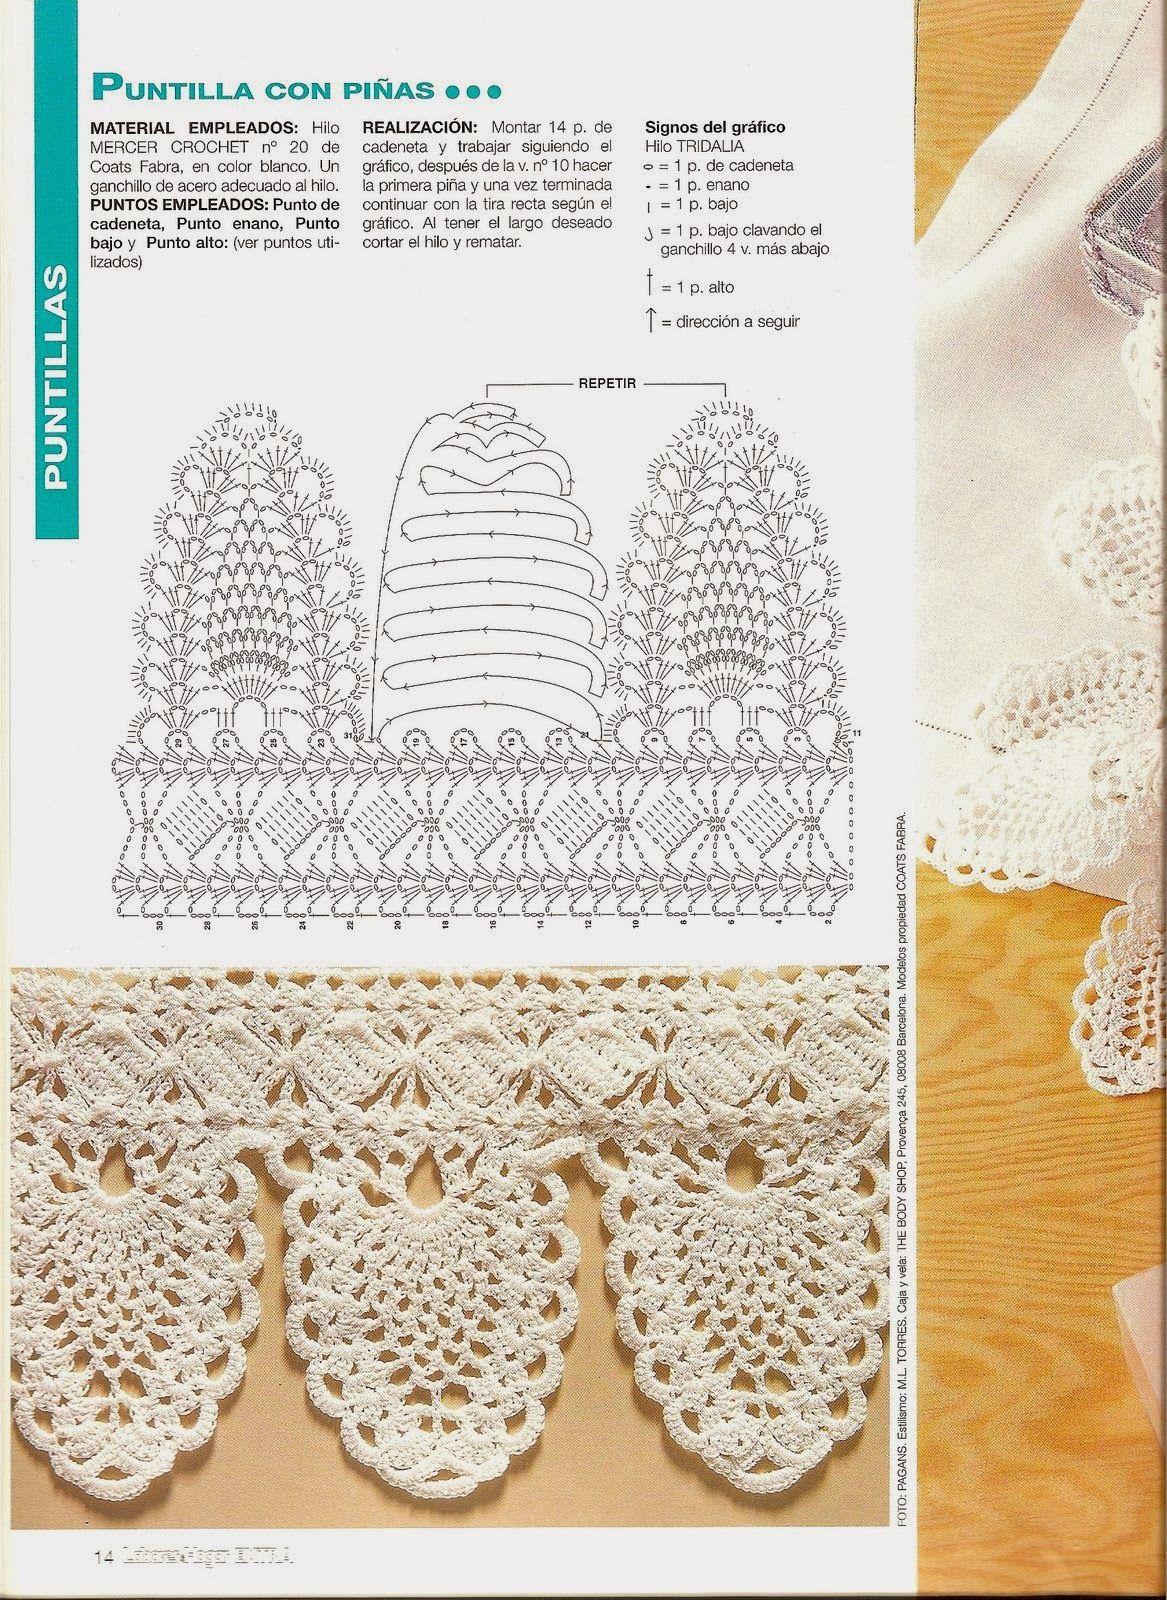 Labores para el hogar en crochet | CROCHET | Pinterest | Labores ...